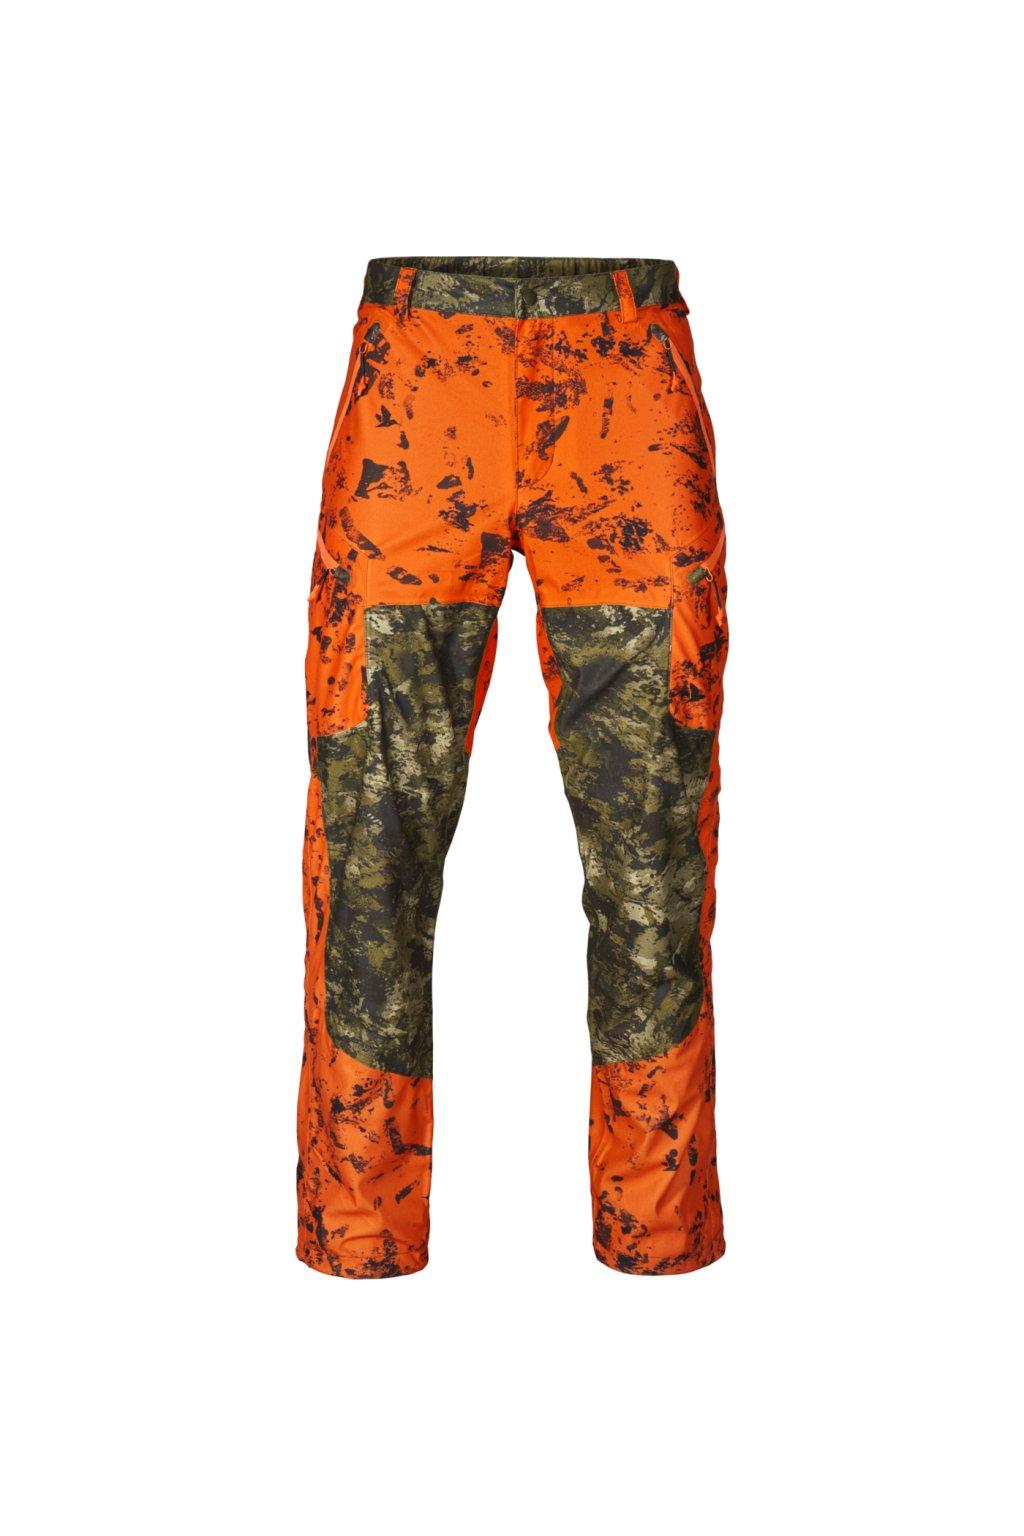 Seeland - Vantage kalhoty InVis green/InVis orange blaze